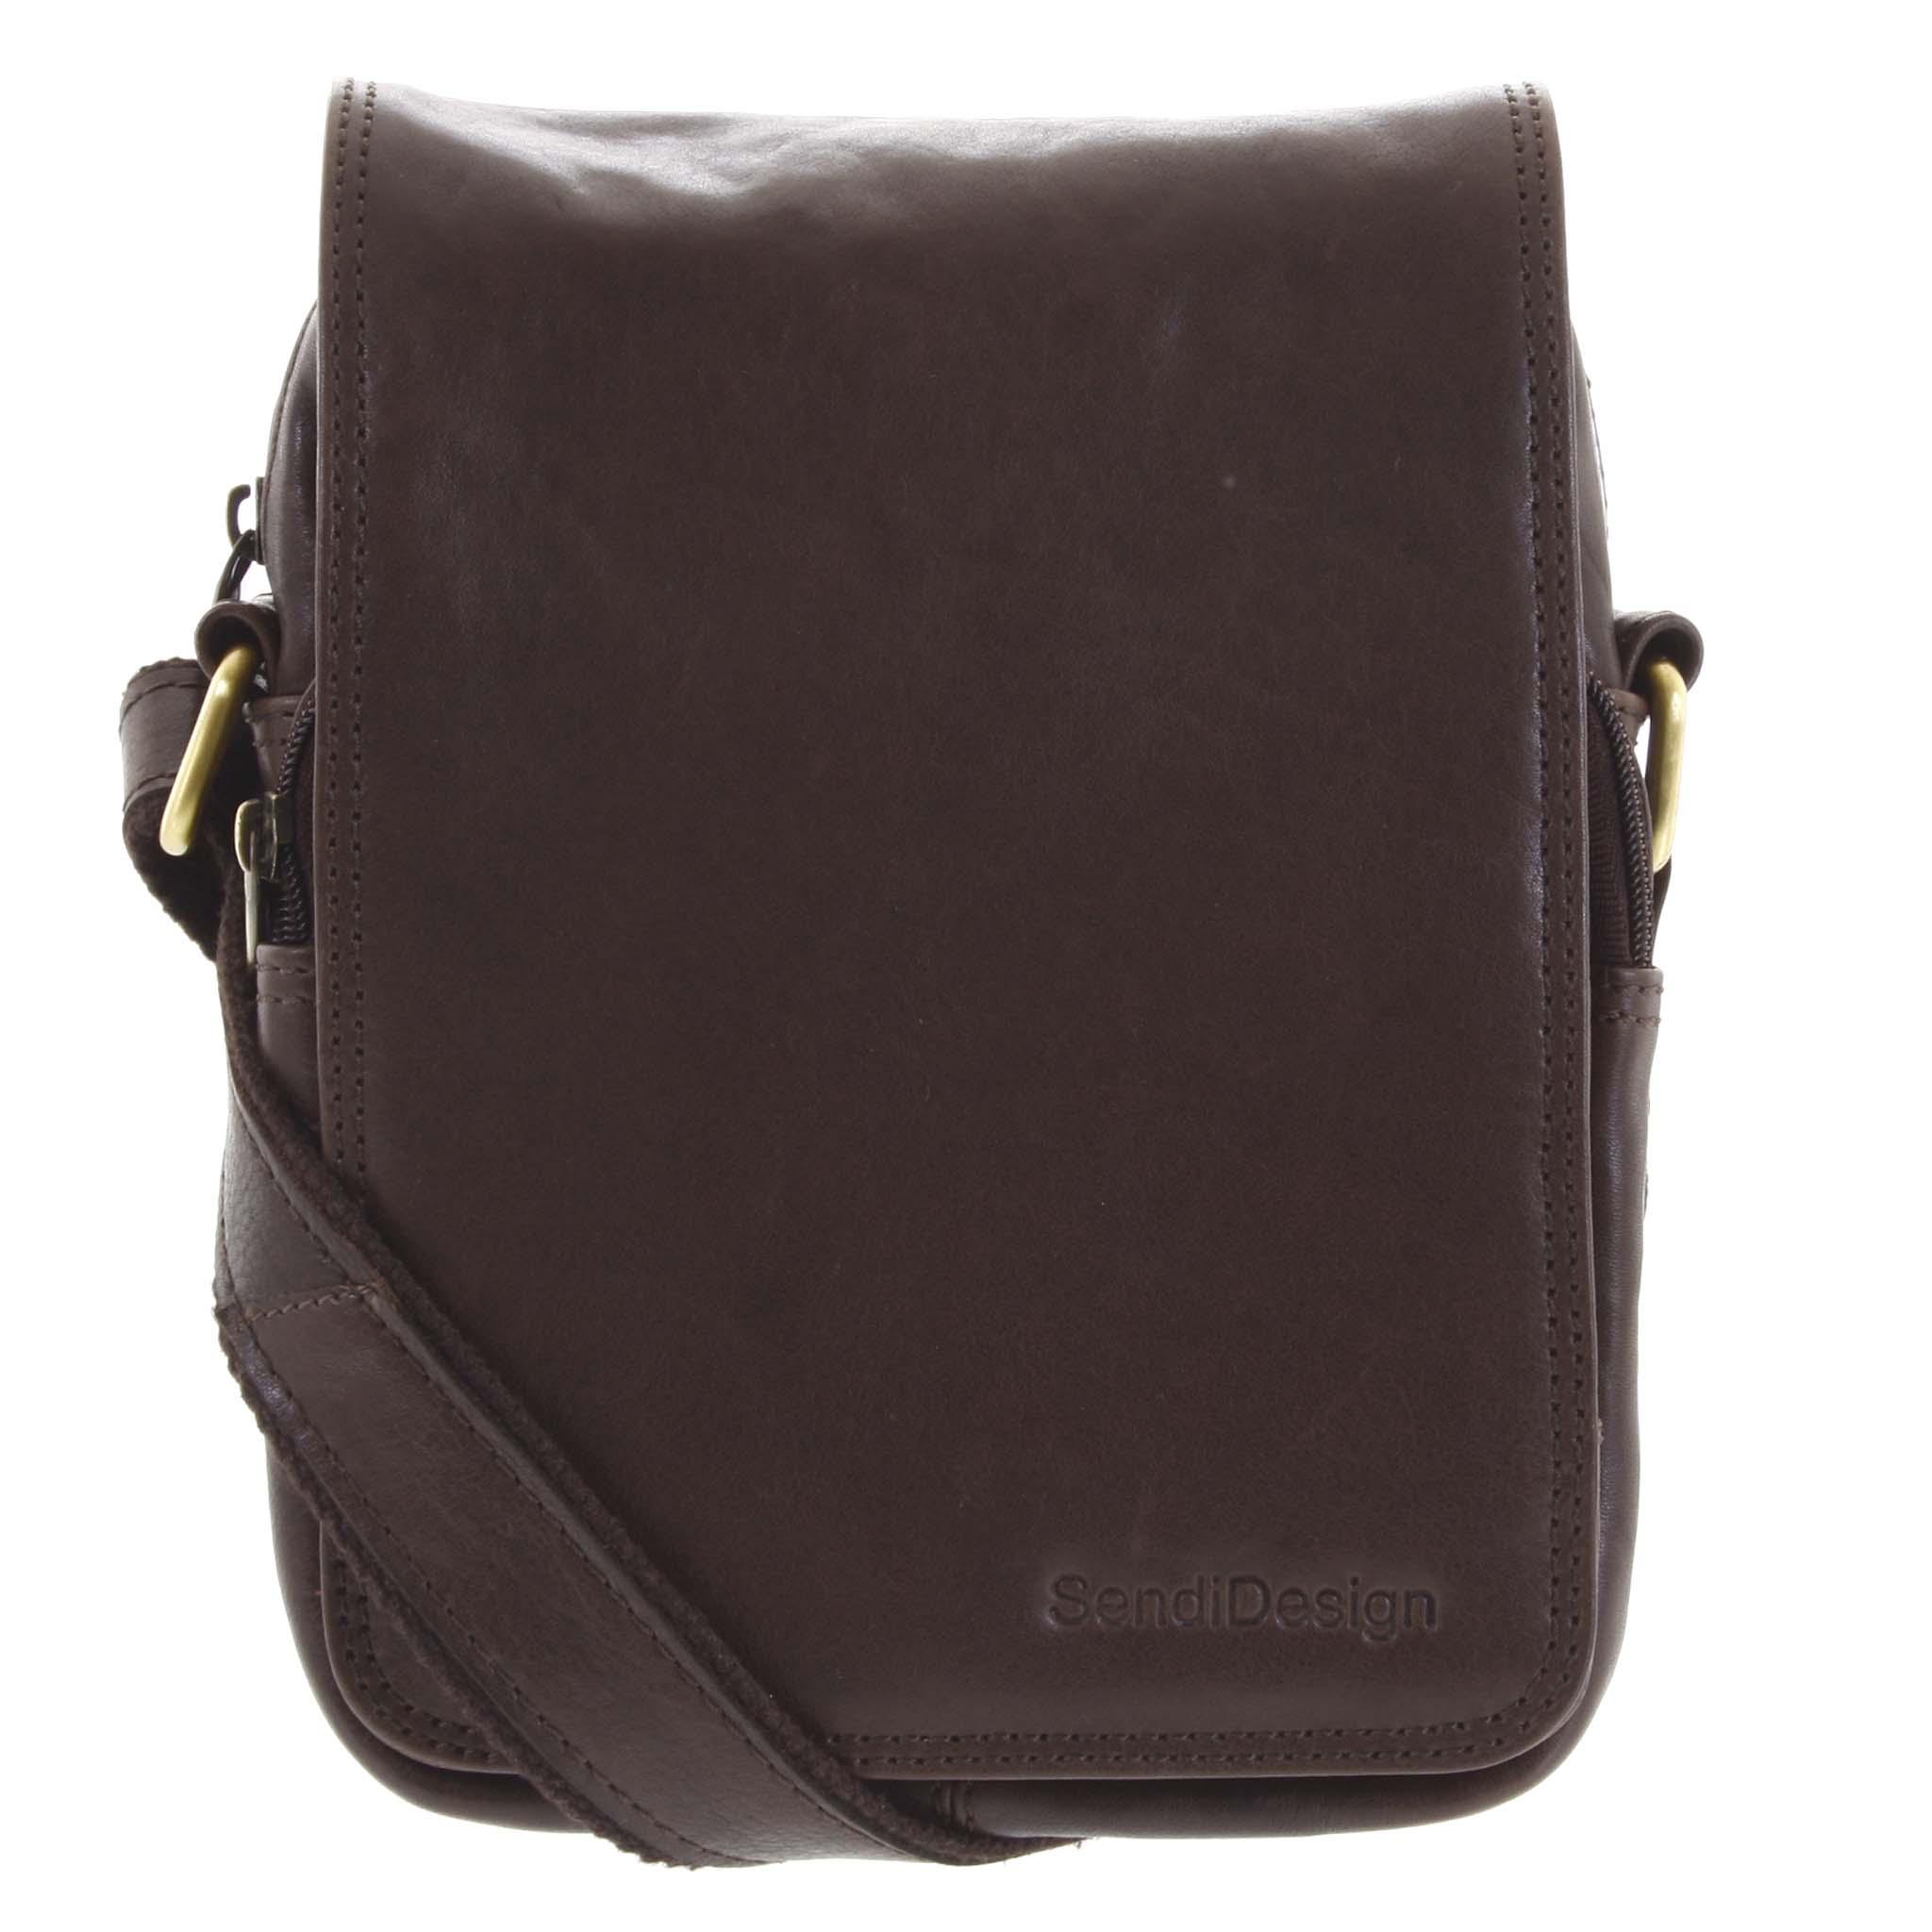 Pánská kožená taška přes rameno tmavě hnědá - SendiDesign Muxos